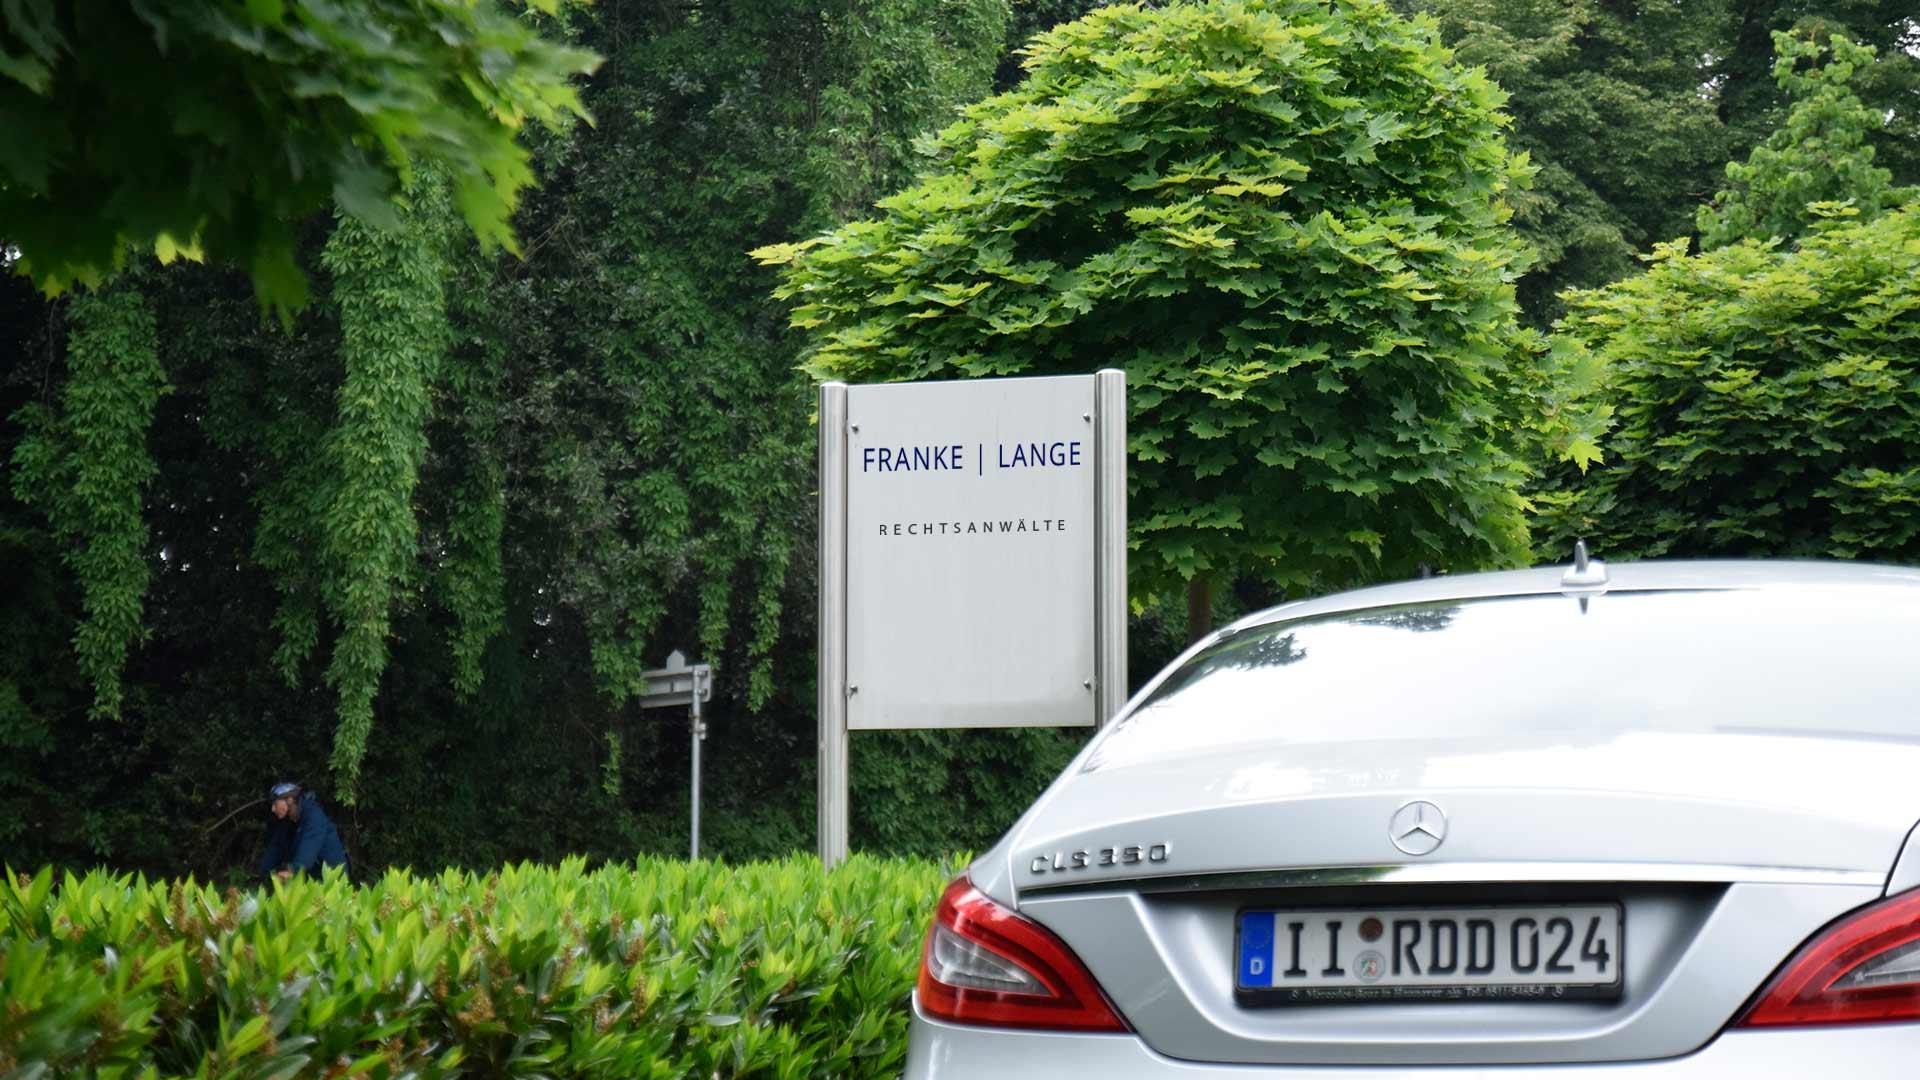 Parkplatz Isselhorst an der Kanzlei